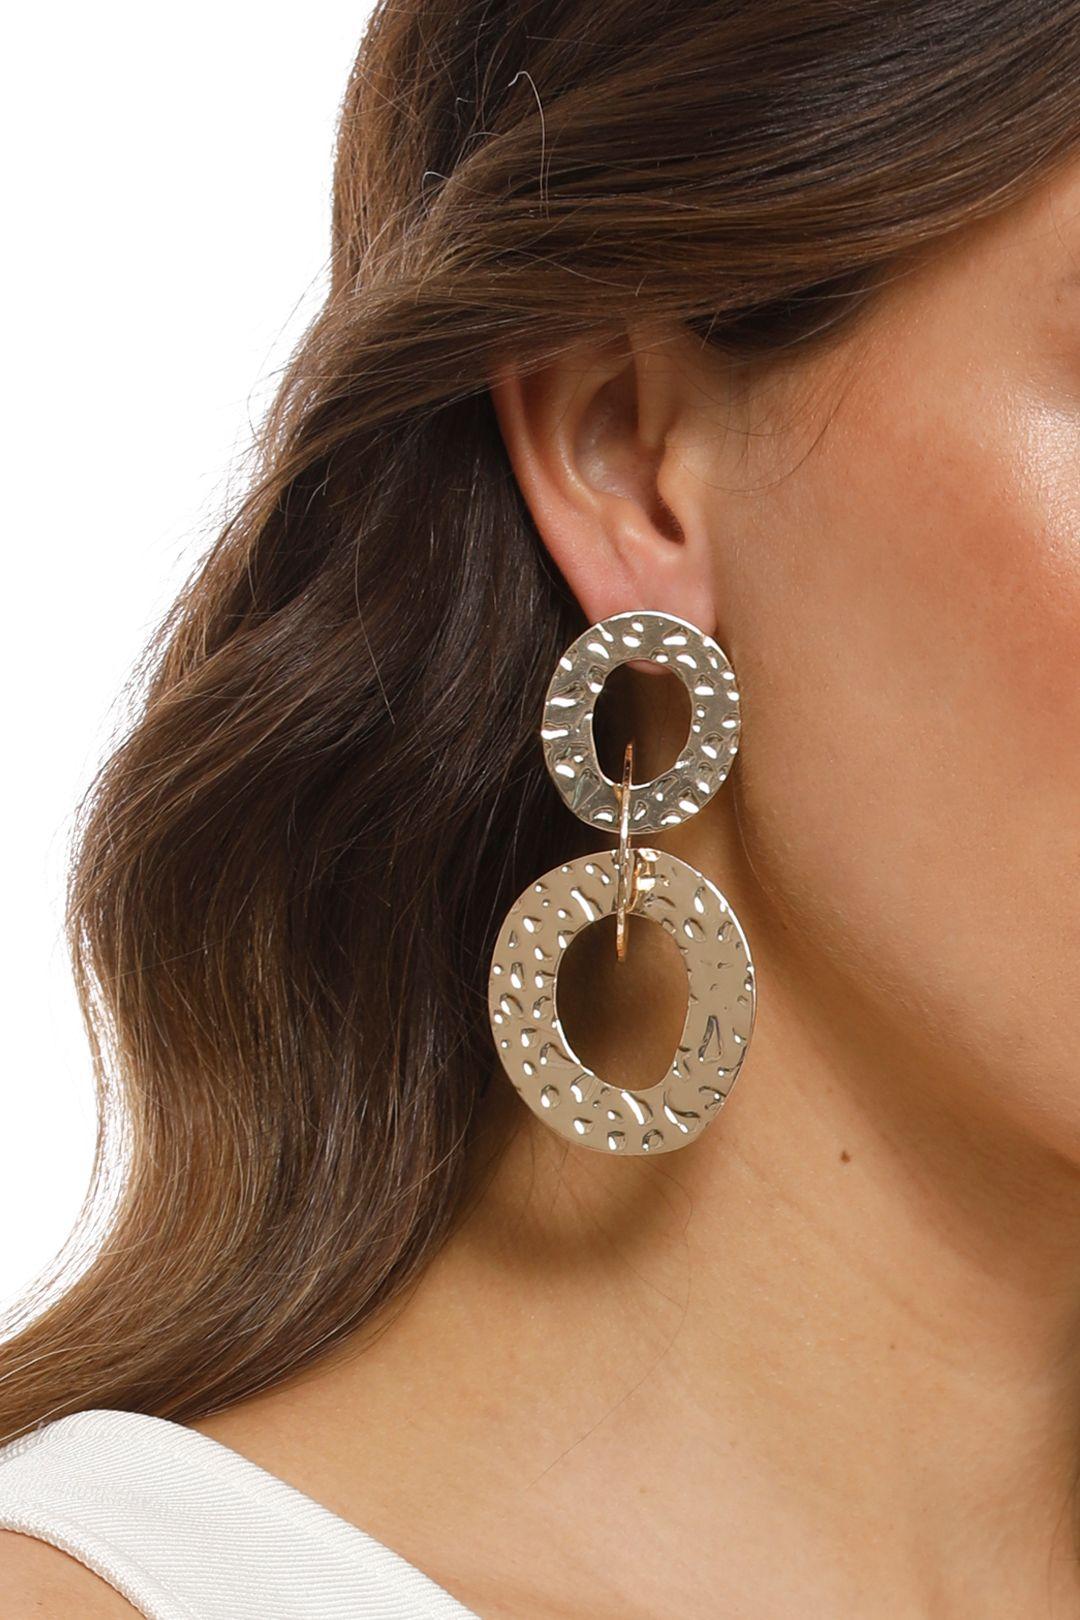 Adorne - Beaten Rings Link Earrings - Gold - Product